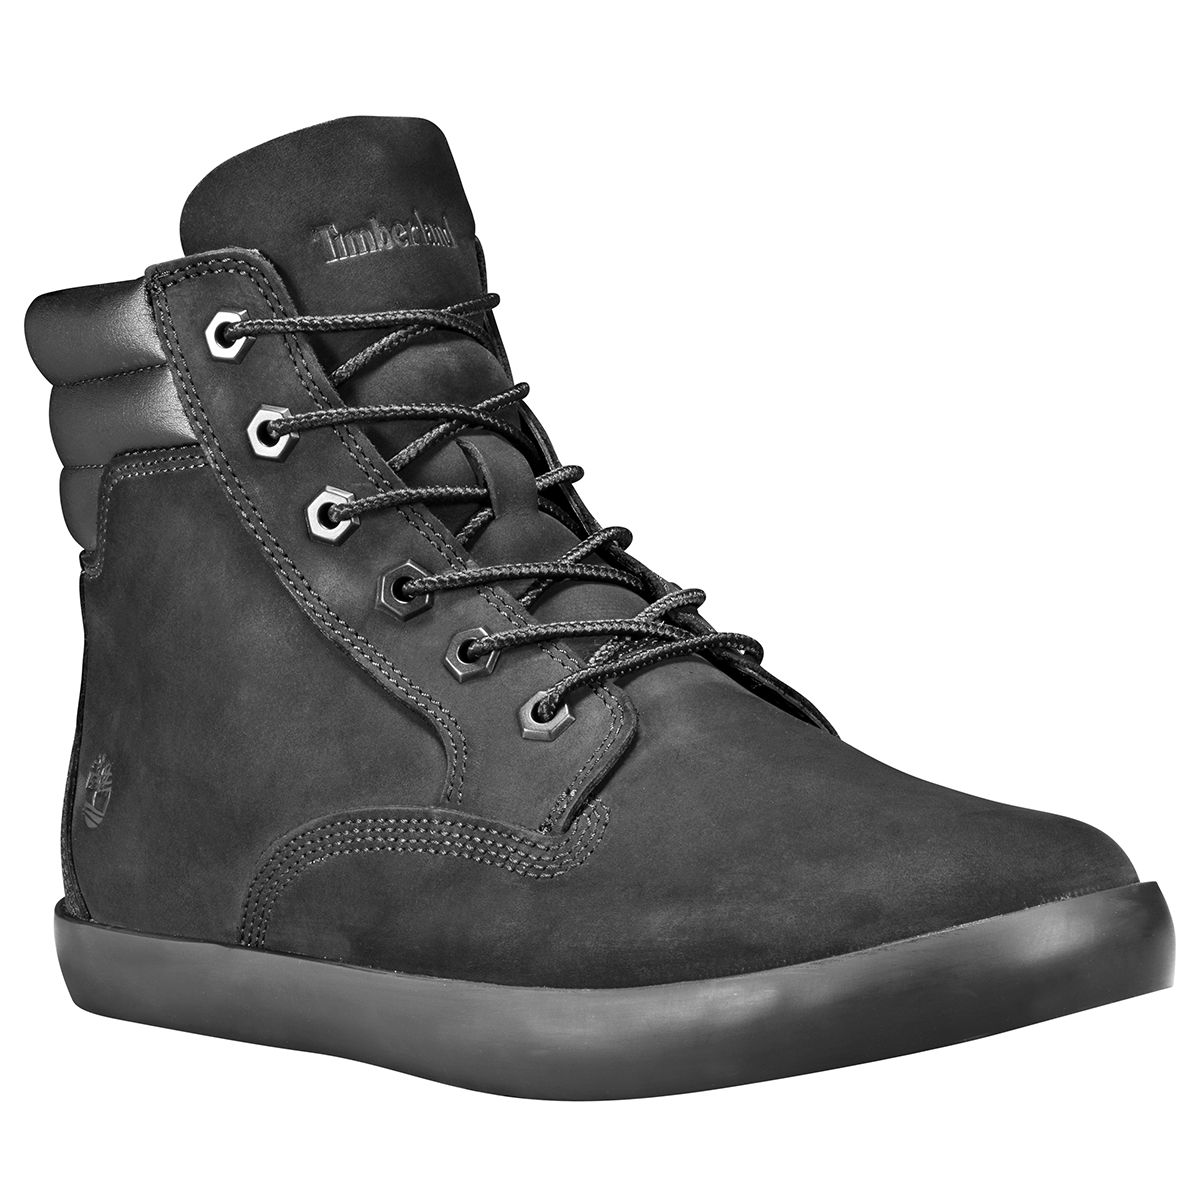 Timberland Women's Dausette Sneaker Boot - Black, 8